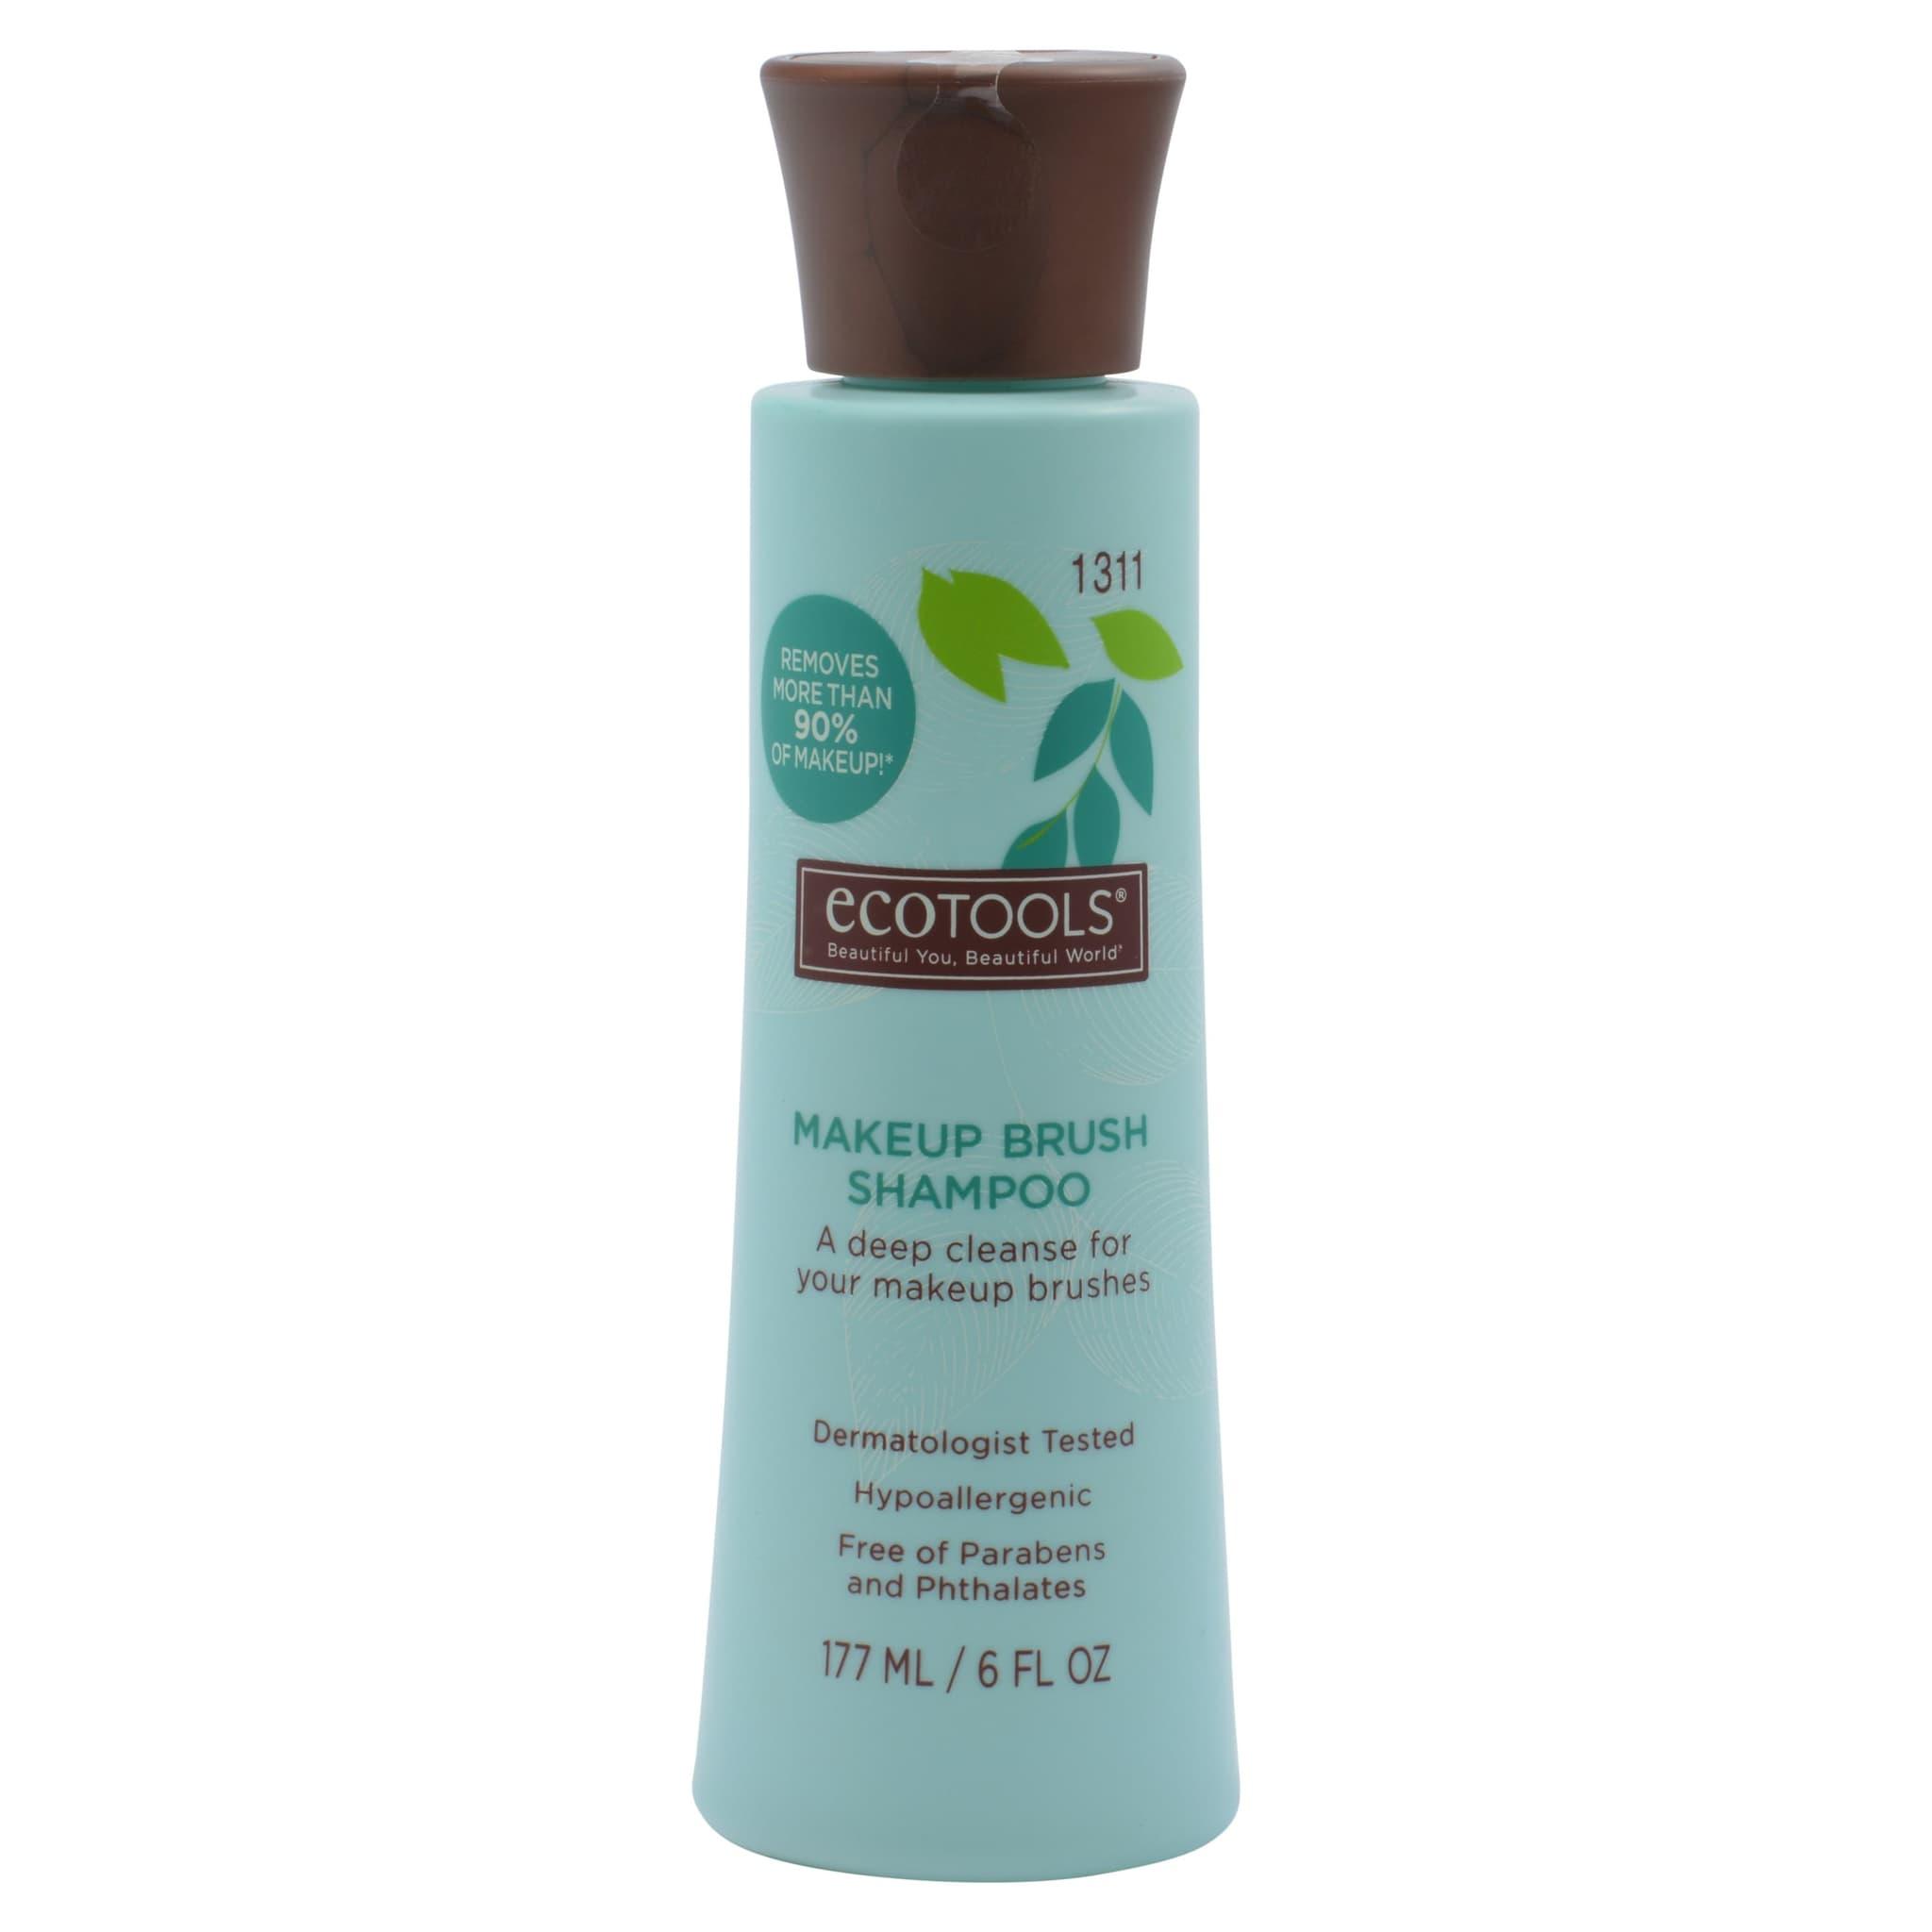 Eco Tools 1311 makeup brush shampoo 177ml thumbnail